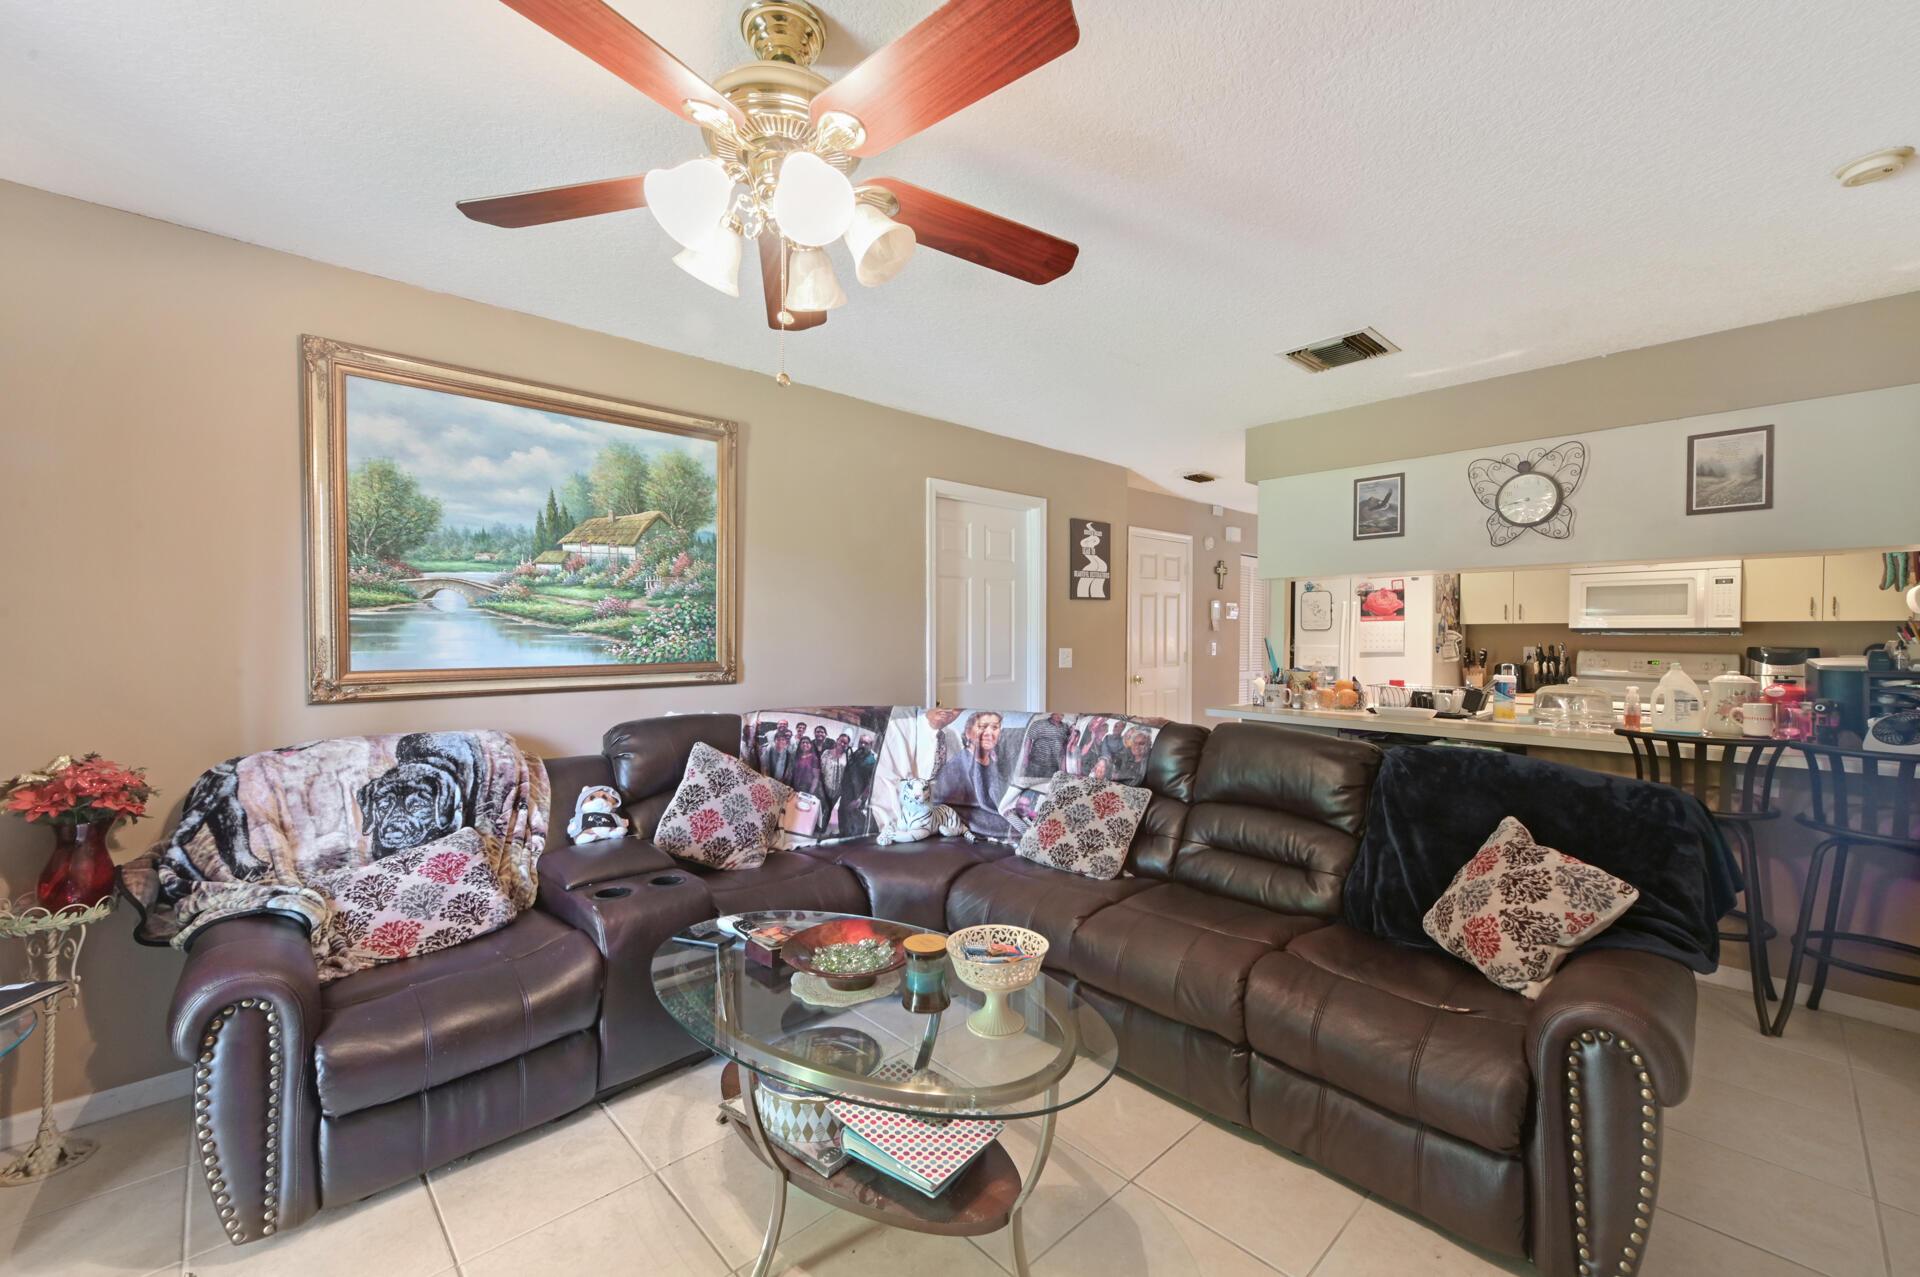 1020-02 Living Room_002